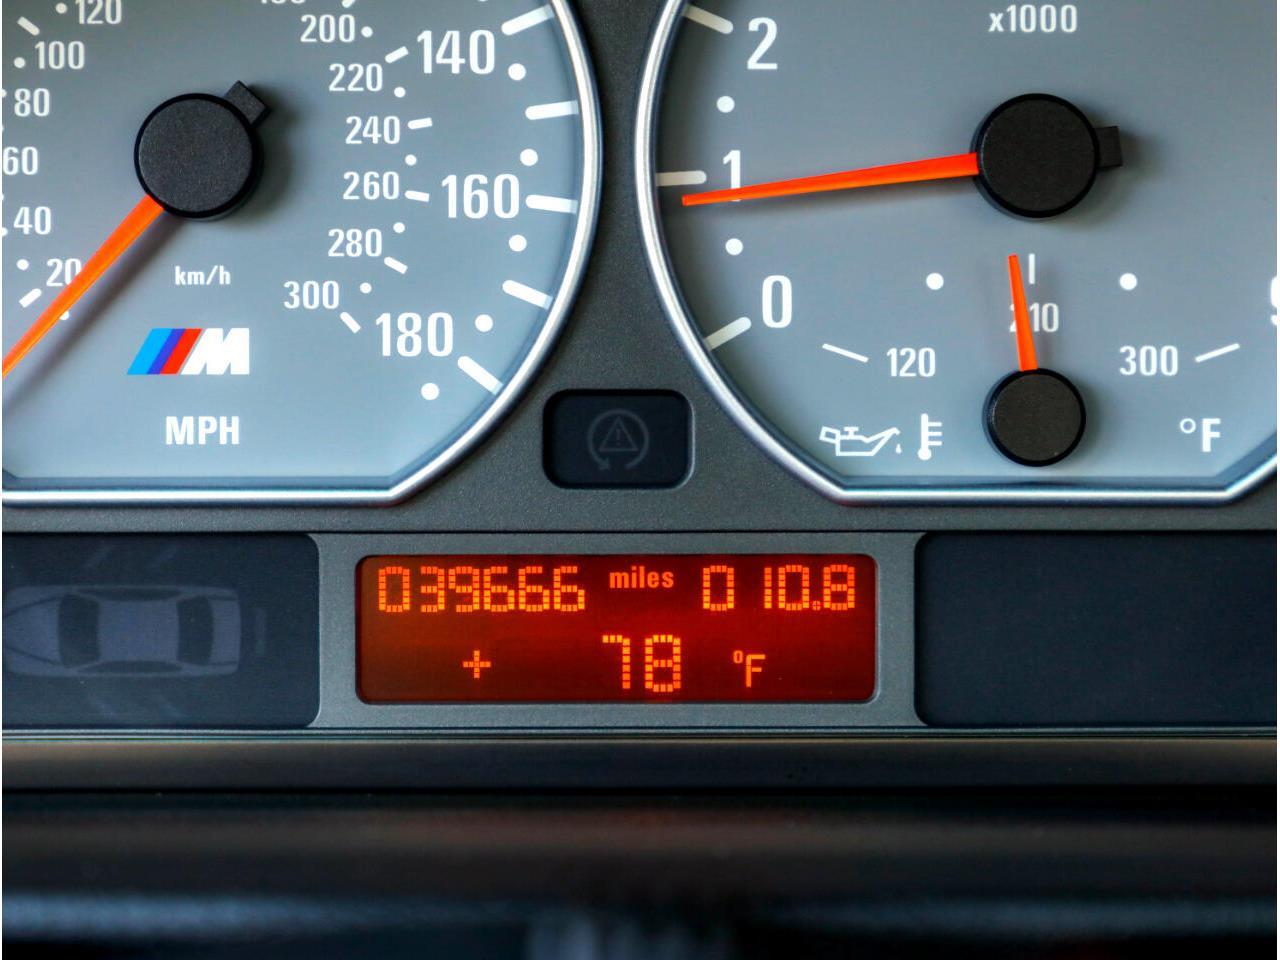 2006 BMW M3 (CC-1263968) for sale in Marina Del Rey, California